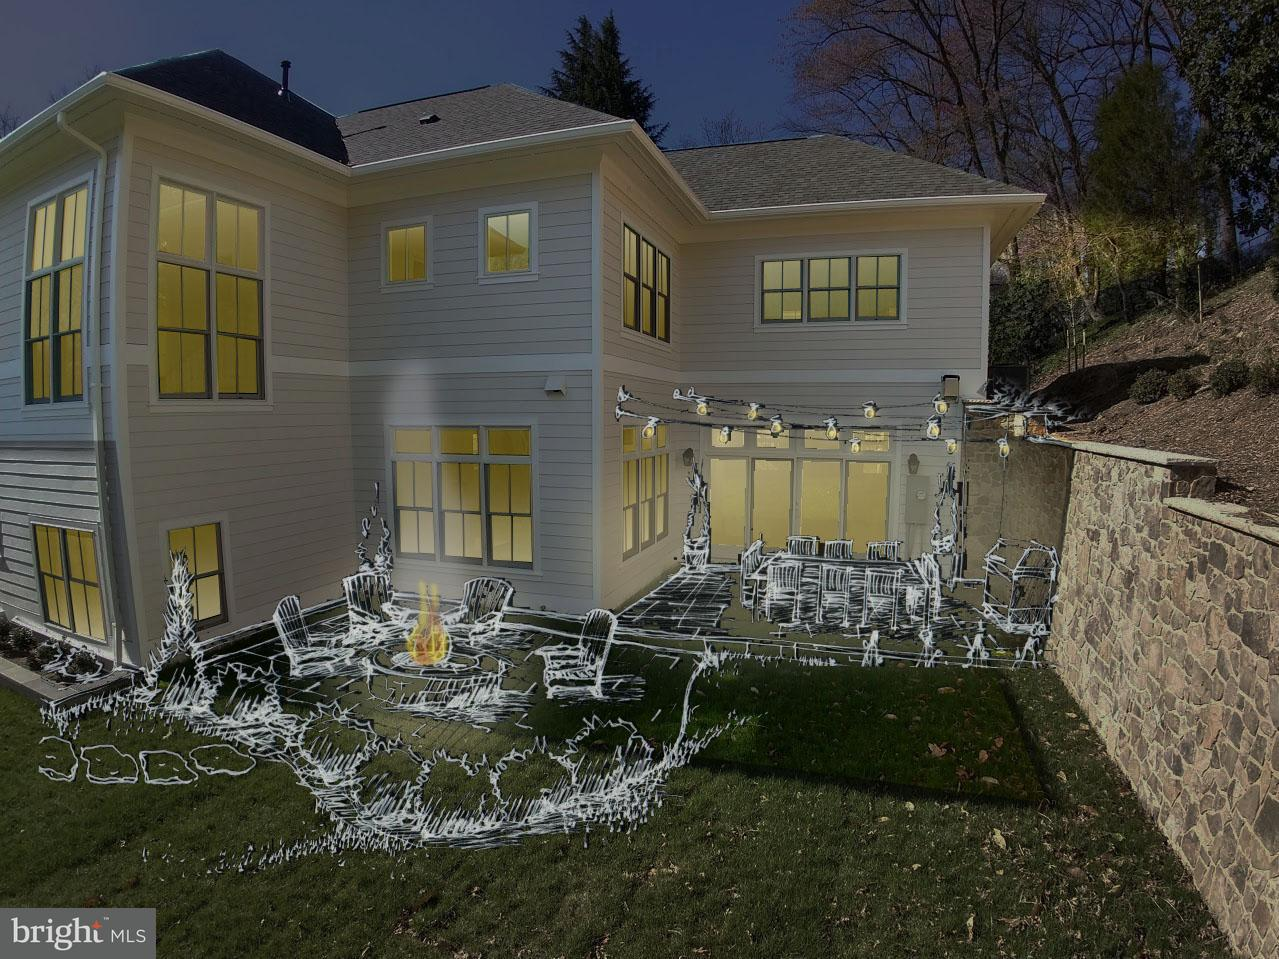 Single Family Home for Sale at 3530 Utah St N 3530 Utah St N Arlington, Virginia 22207 United States